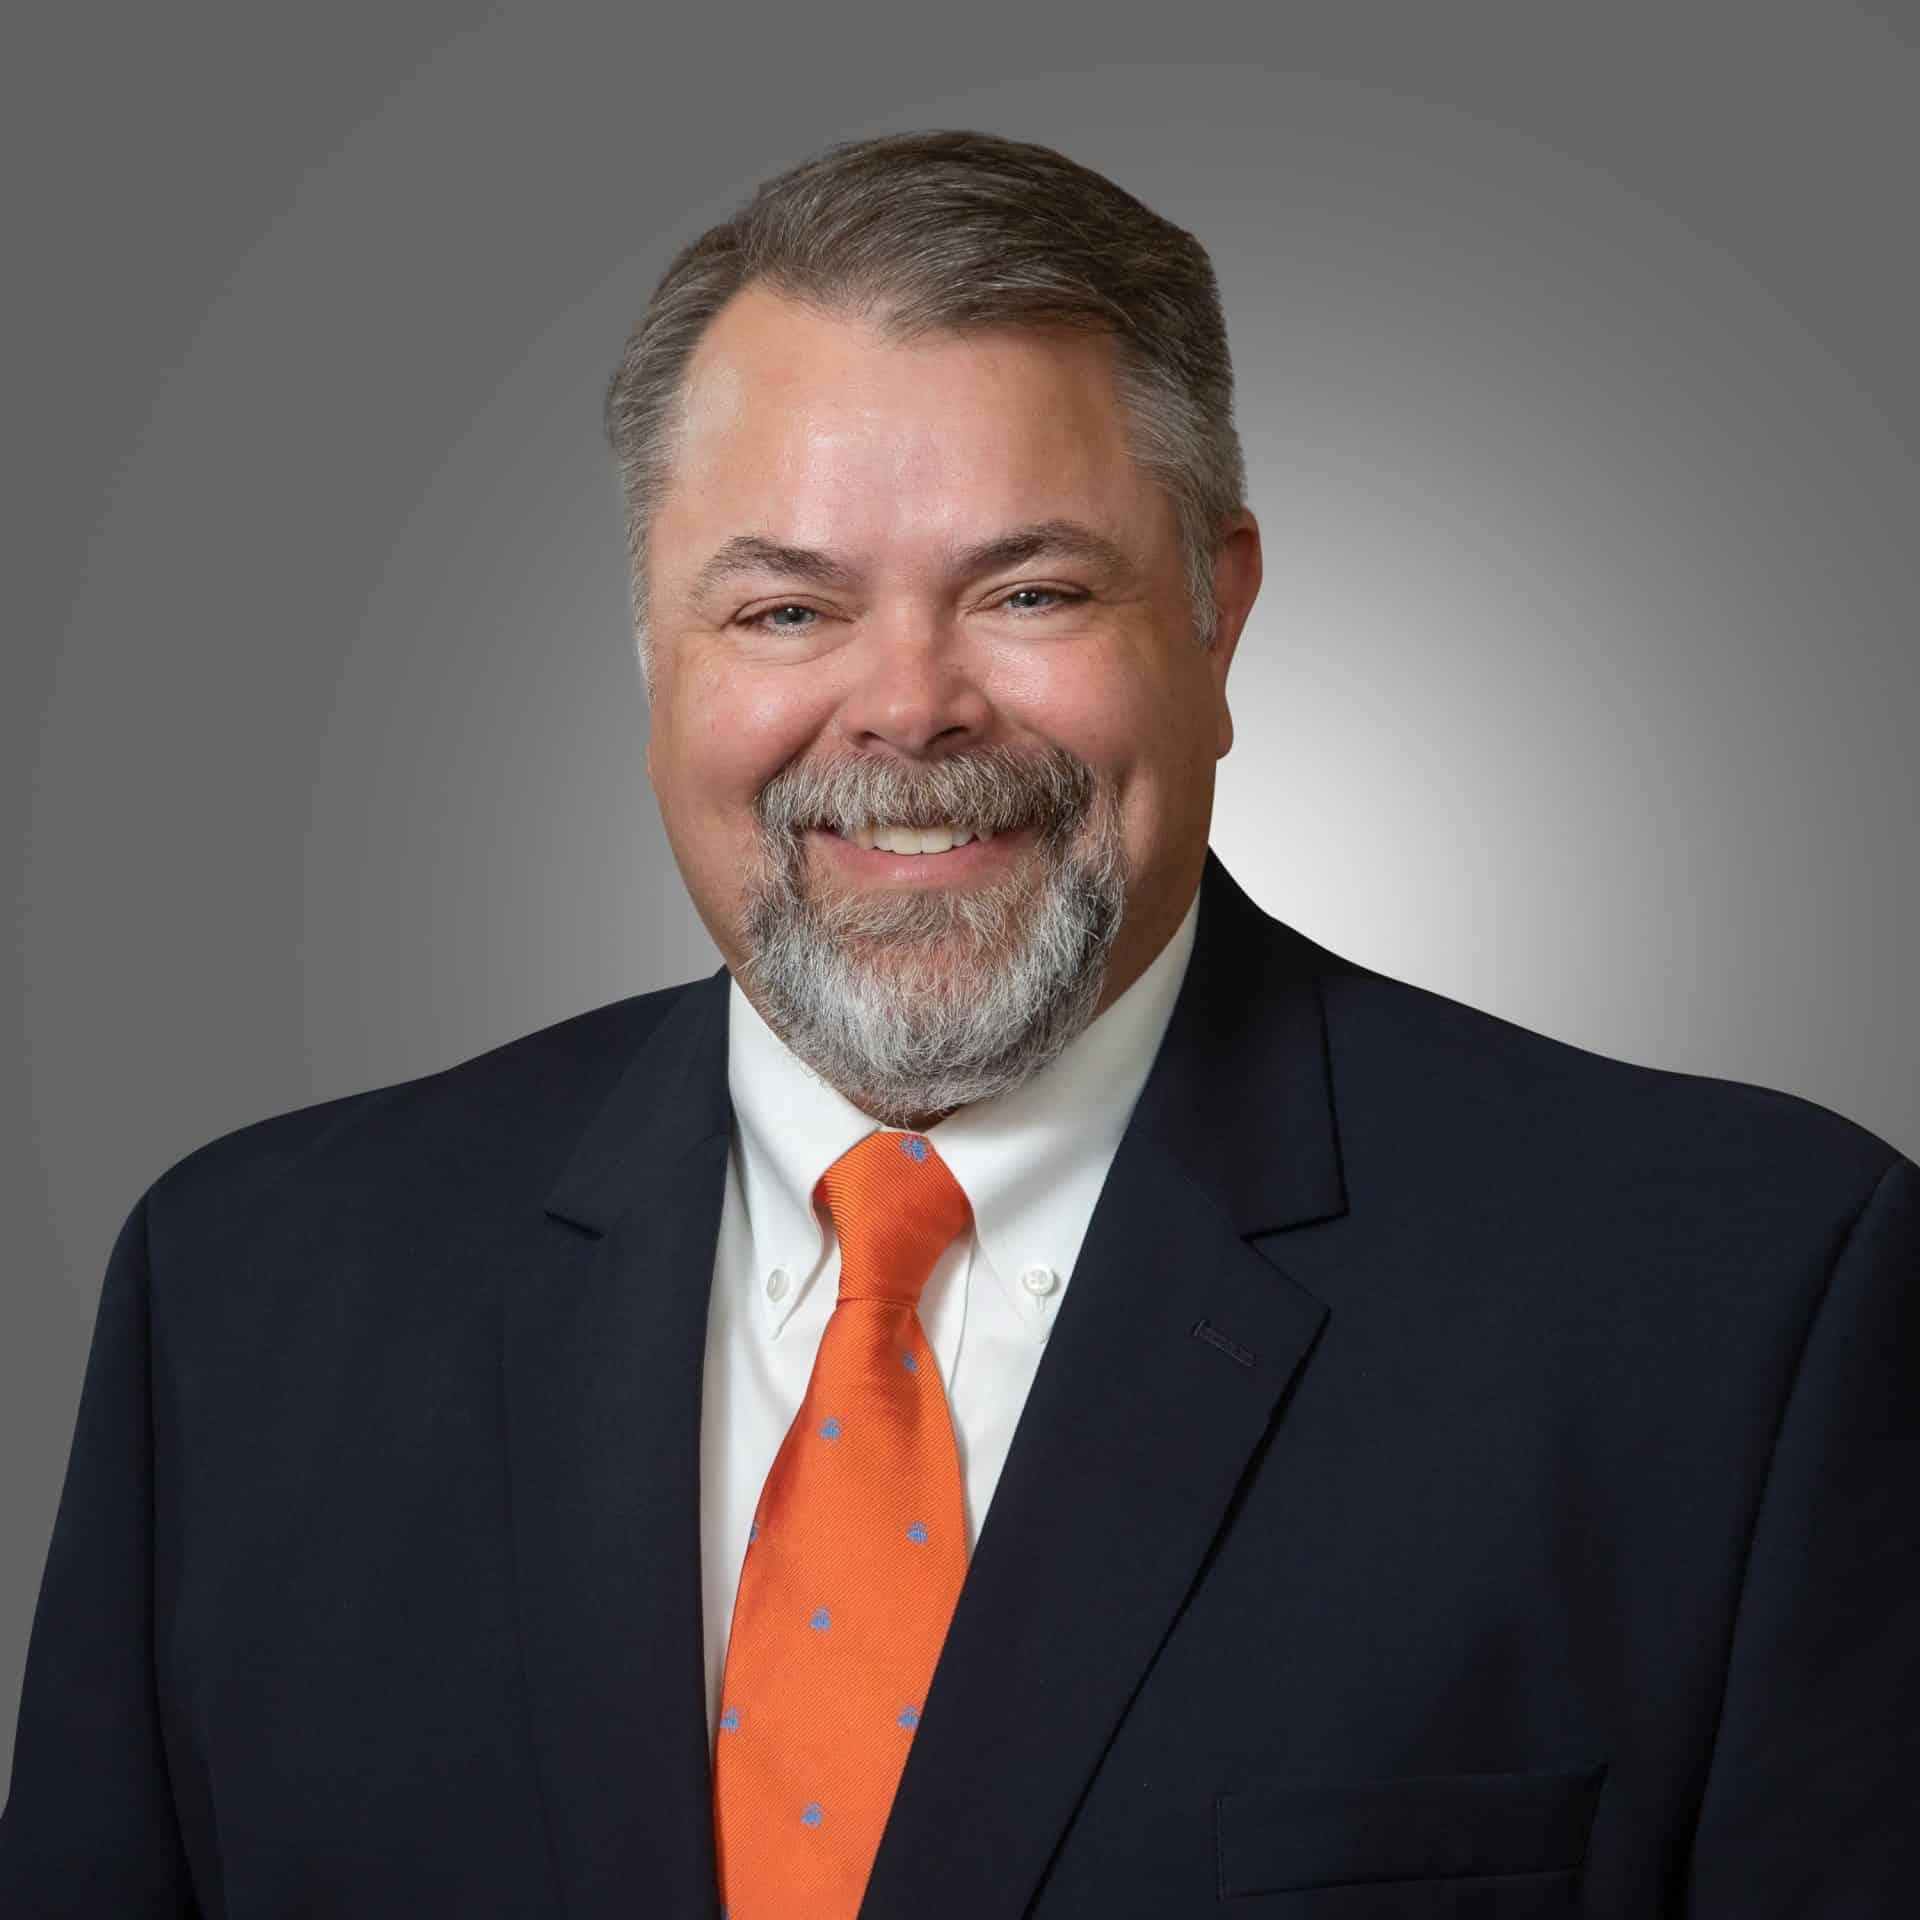 Sean R. Parker